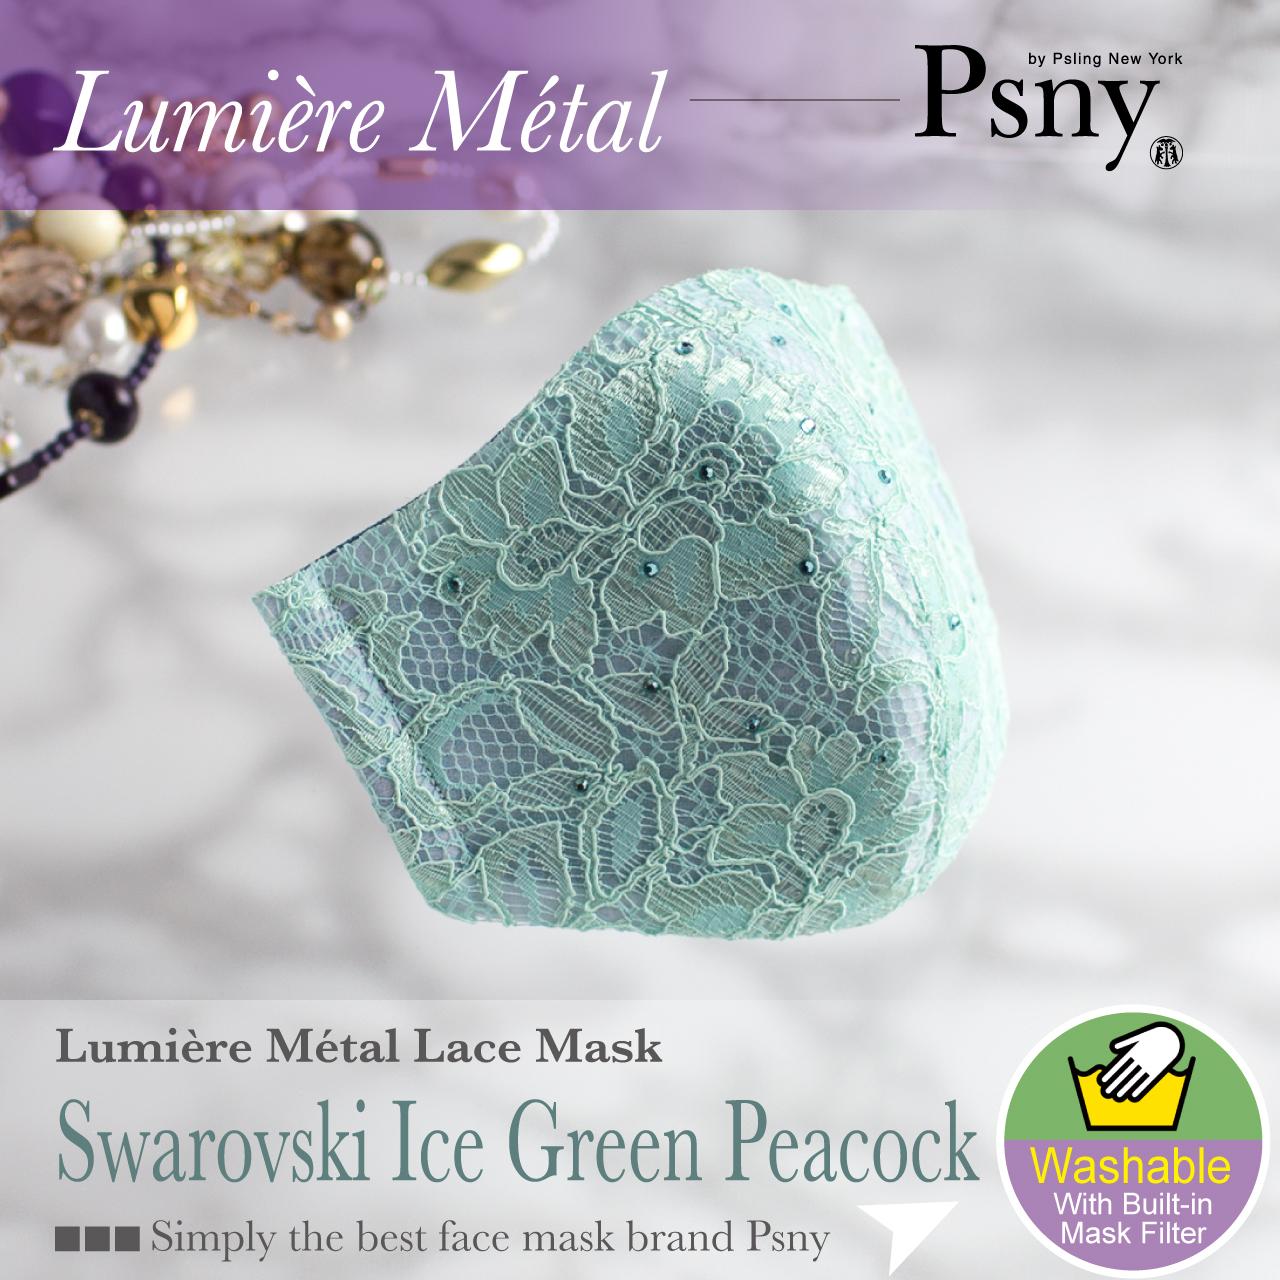 PSNY スワロフスキー レース・アイスグリーン ピーコック 花粉 黄砂 不織布フィルター 立体 大人 美しい マスク 送料無料 LM4s